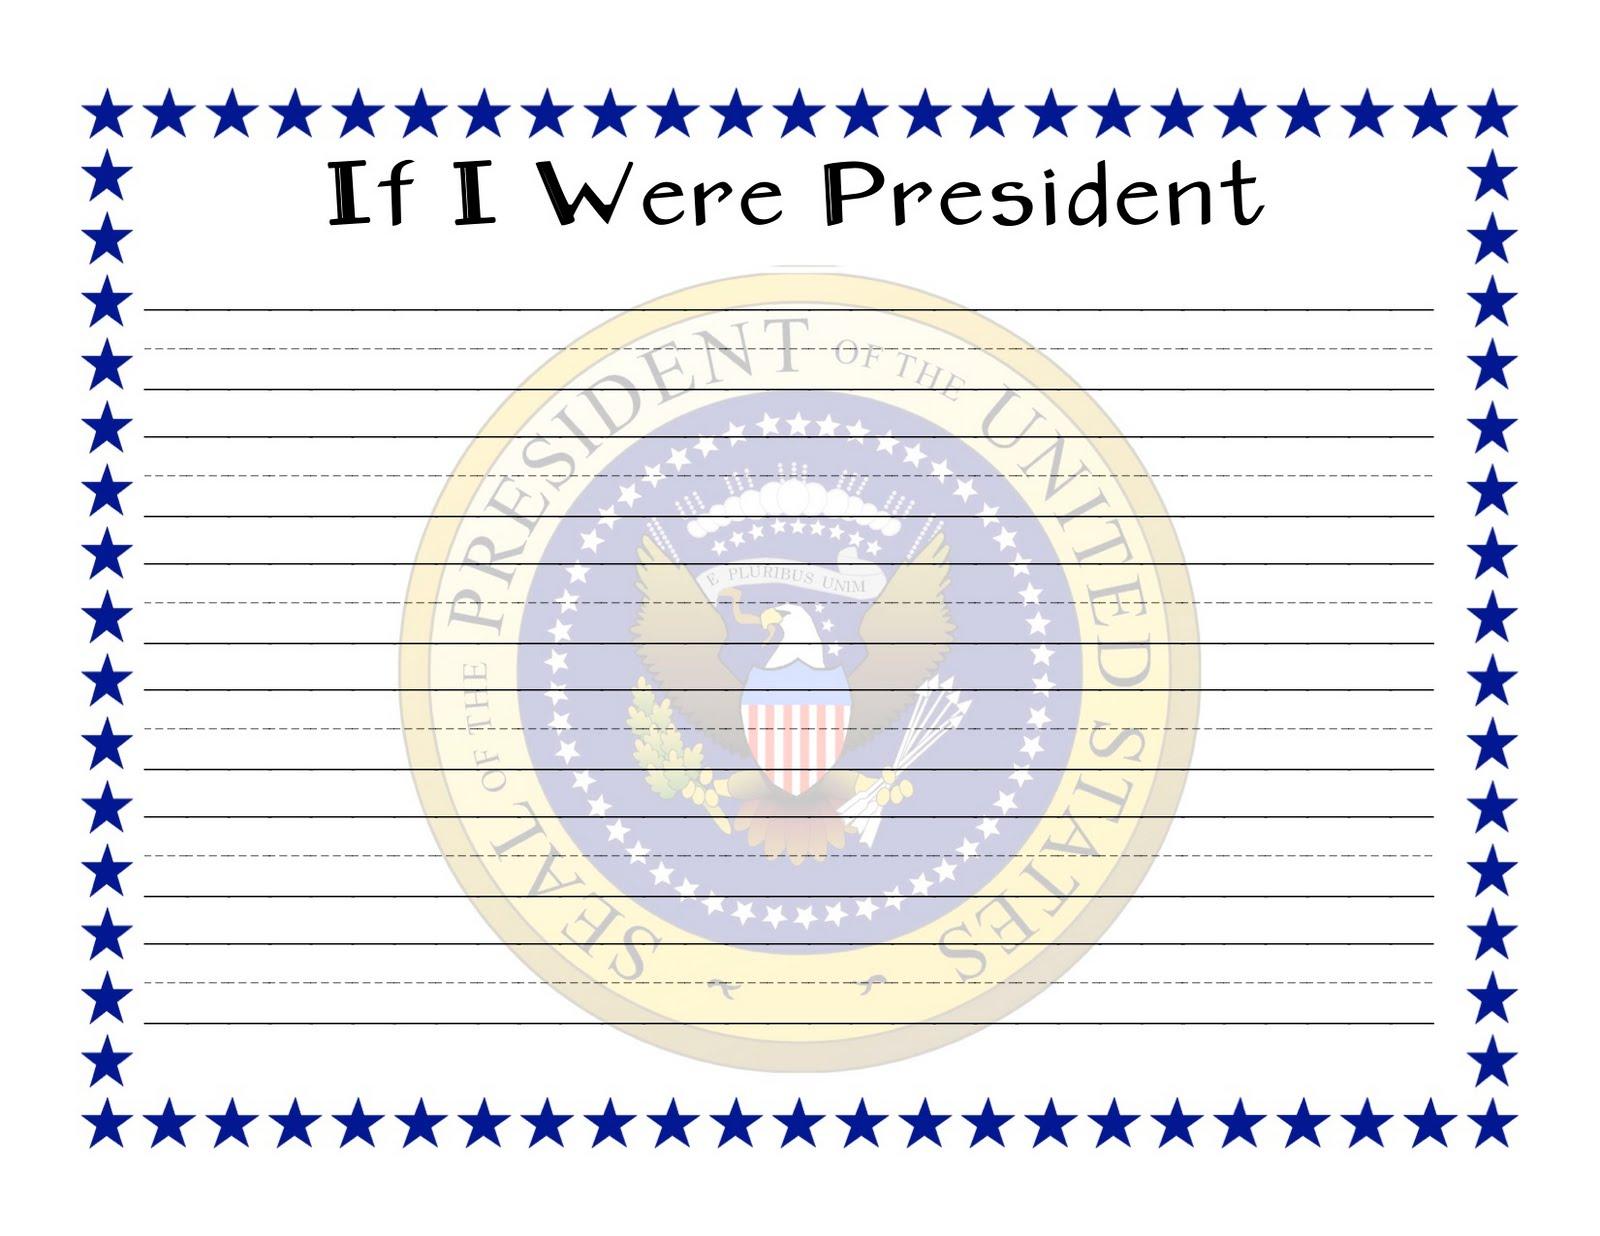 College Essays, College Application Essays - If i were president essay ...